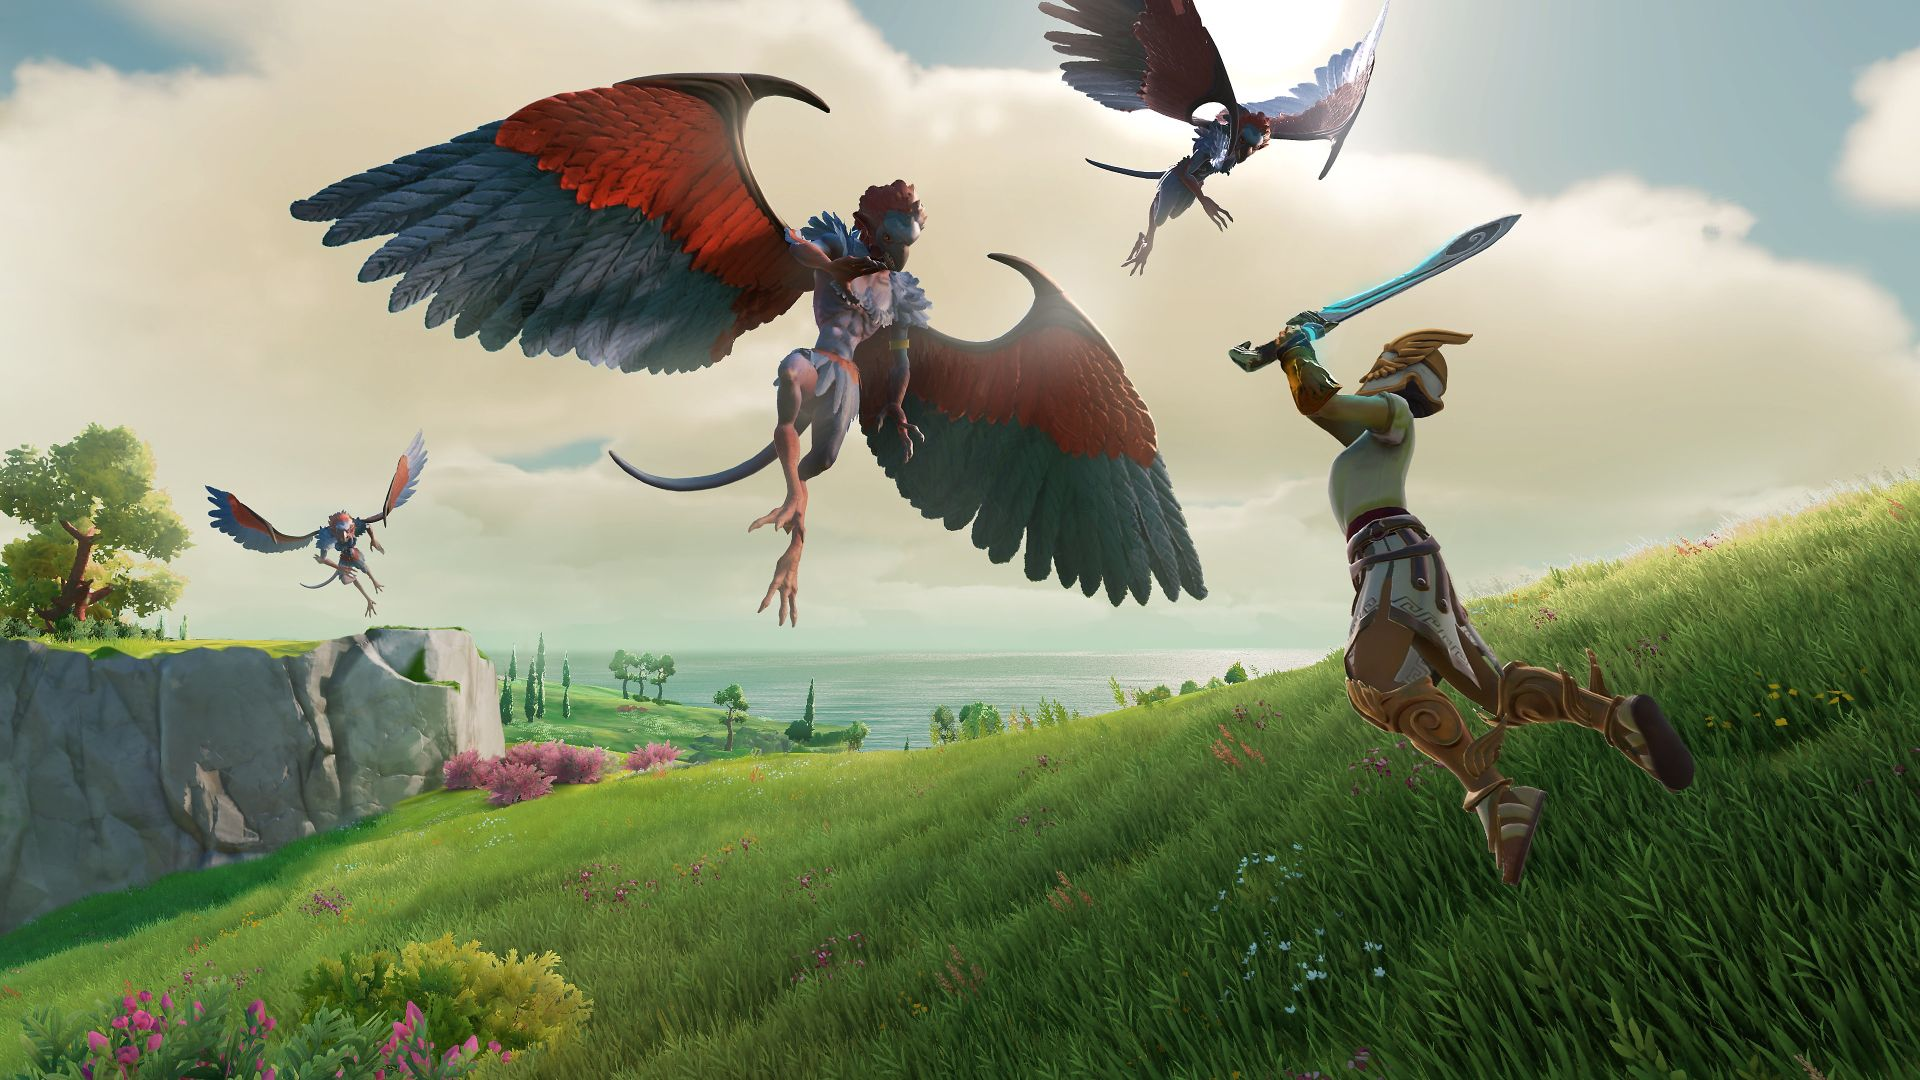 Gods And Monsters یک بازی خانوادگی خواهد بود